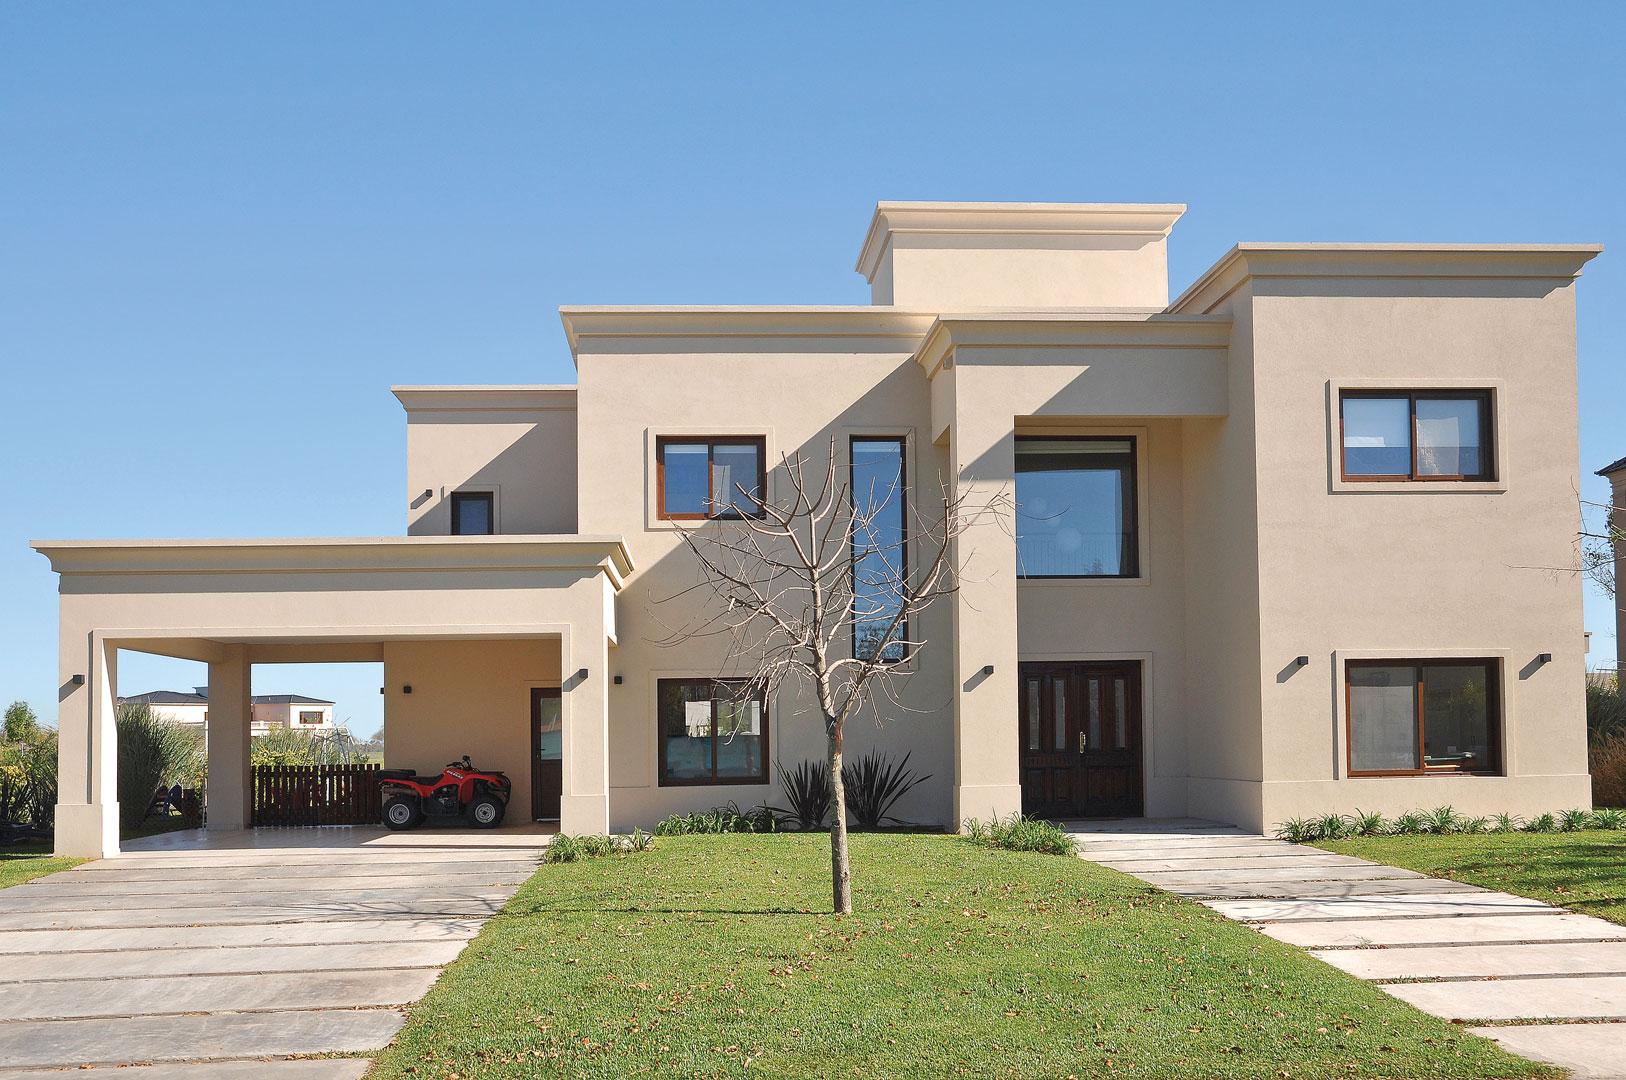 Estudio farina vazzano casa 6 neocl sica portal de arquitectos - Casas clasicas modernas ...